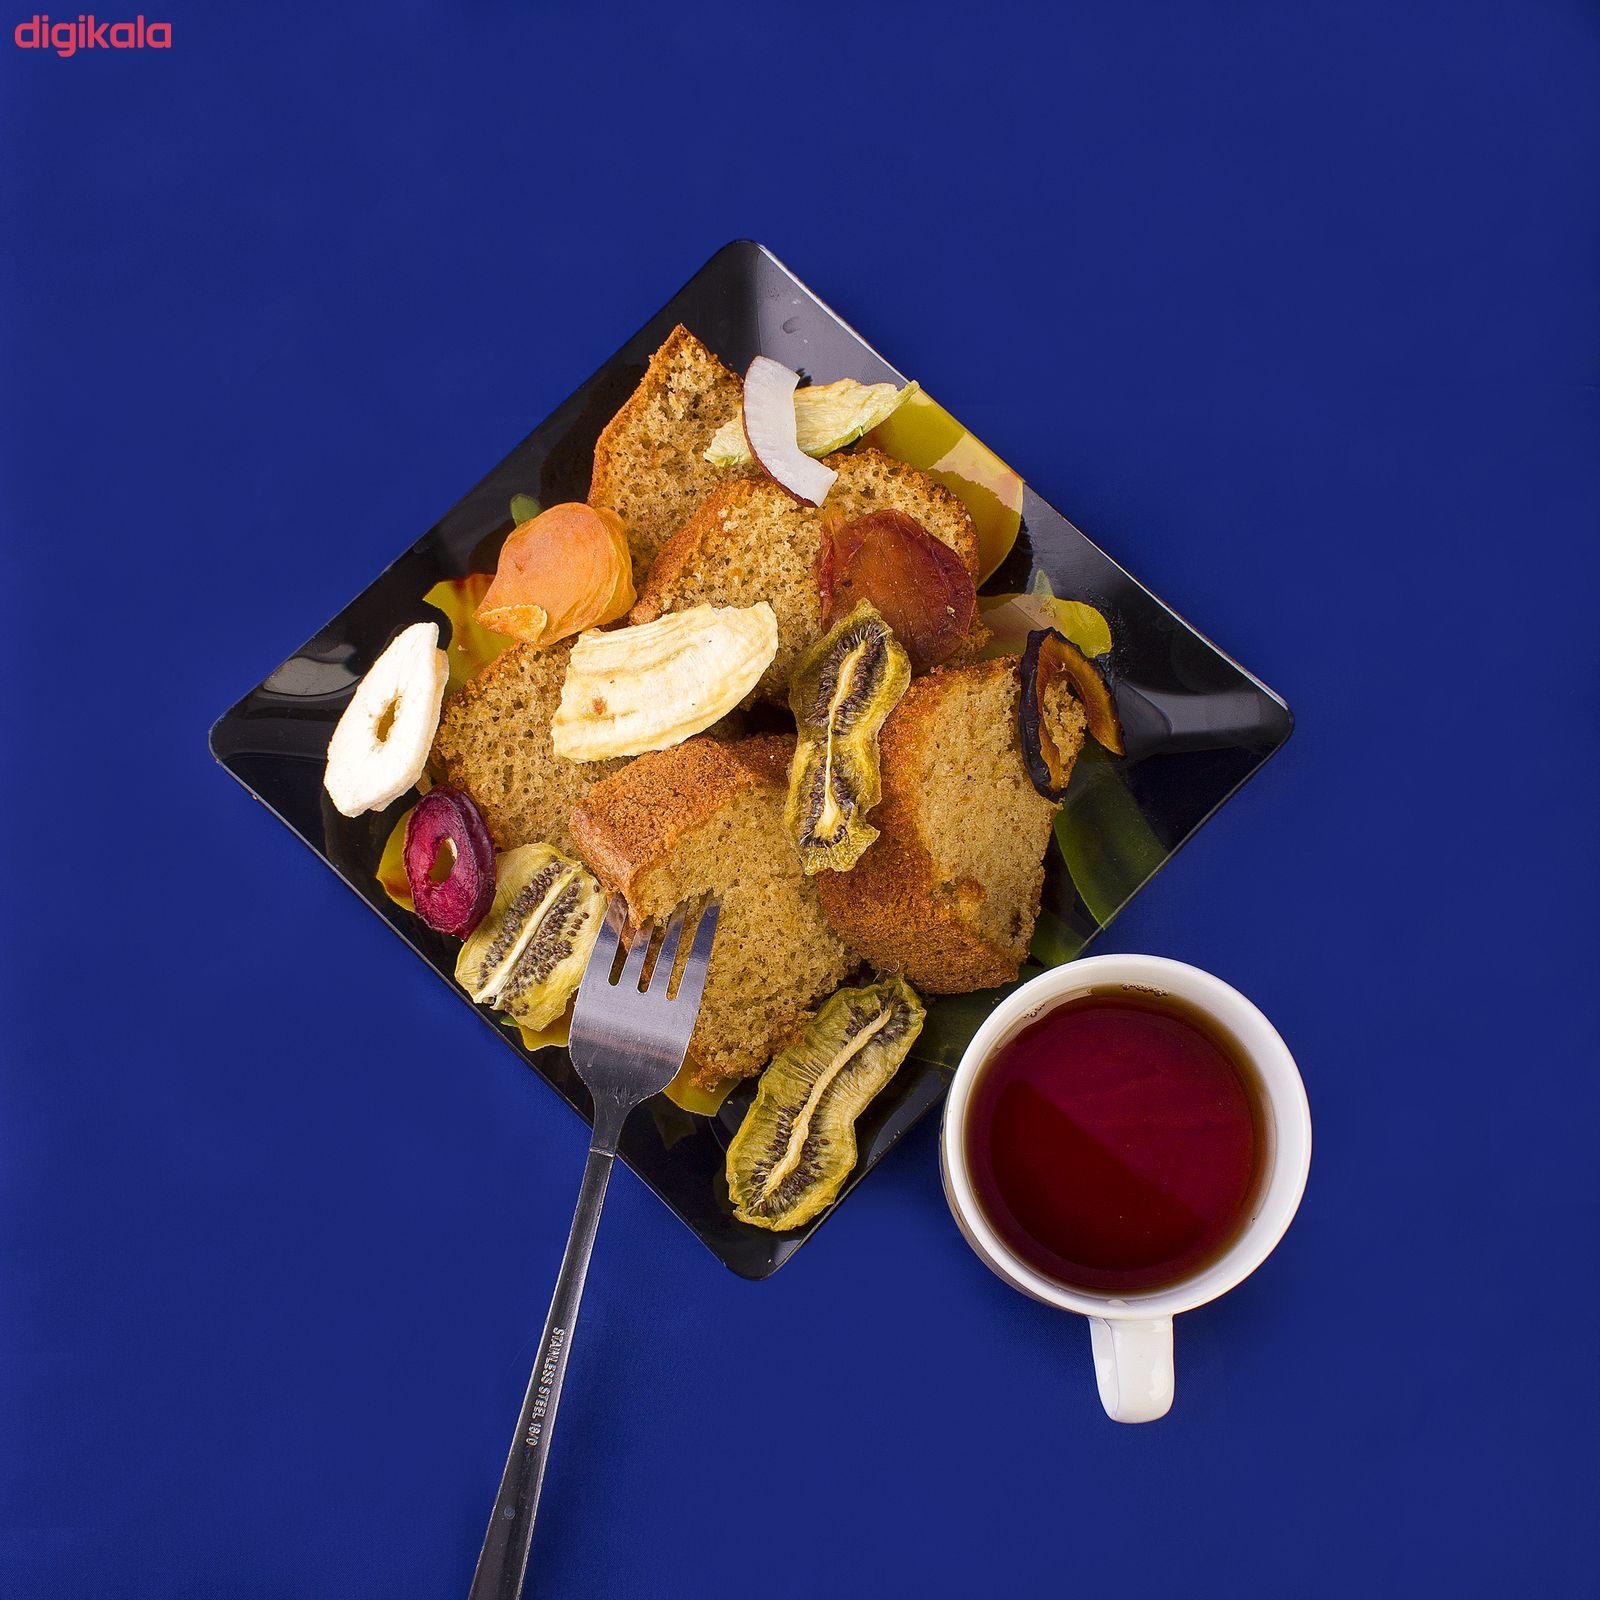 کیک روغنی هویج گردو مهفام - 620 گرم  main 1 7